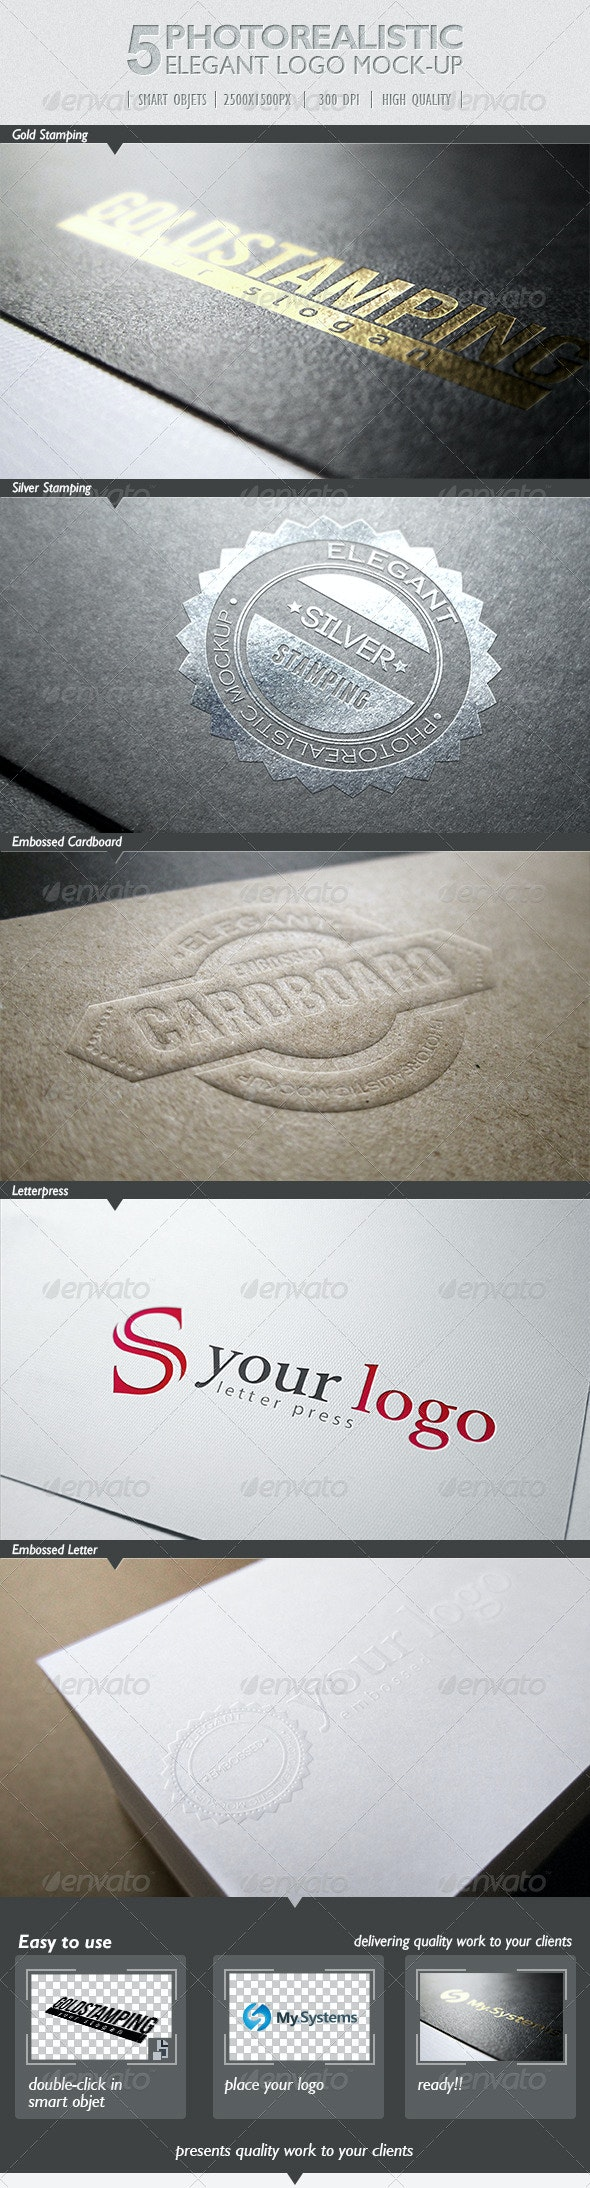 5 Photorealistic Logo Mock-Up | Pack 1 - Print Product Mock-Ups